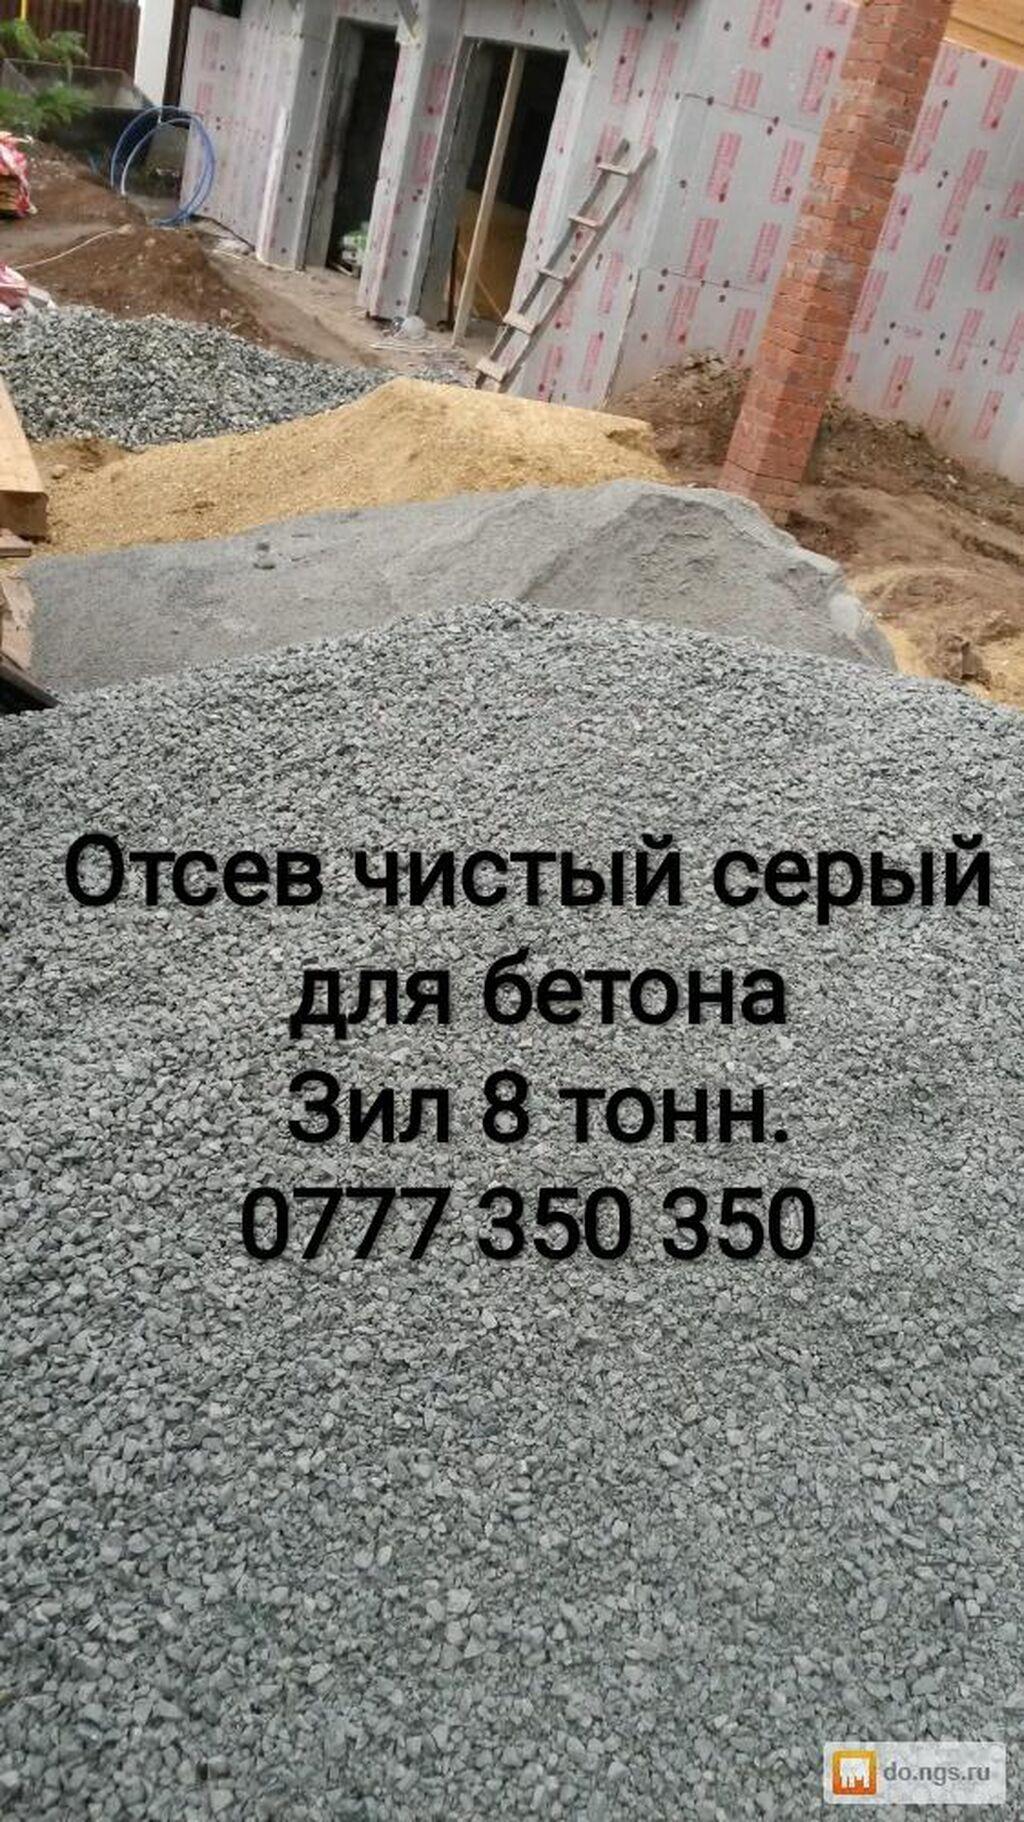 Цемент | M-400 | Гарантия, Бесплатный выезд: Цемент | M-400 | Гарантия, Бесплатный выезд